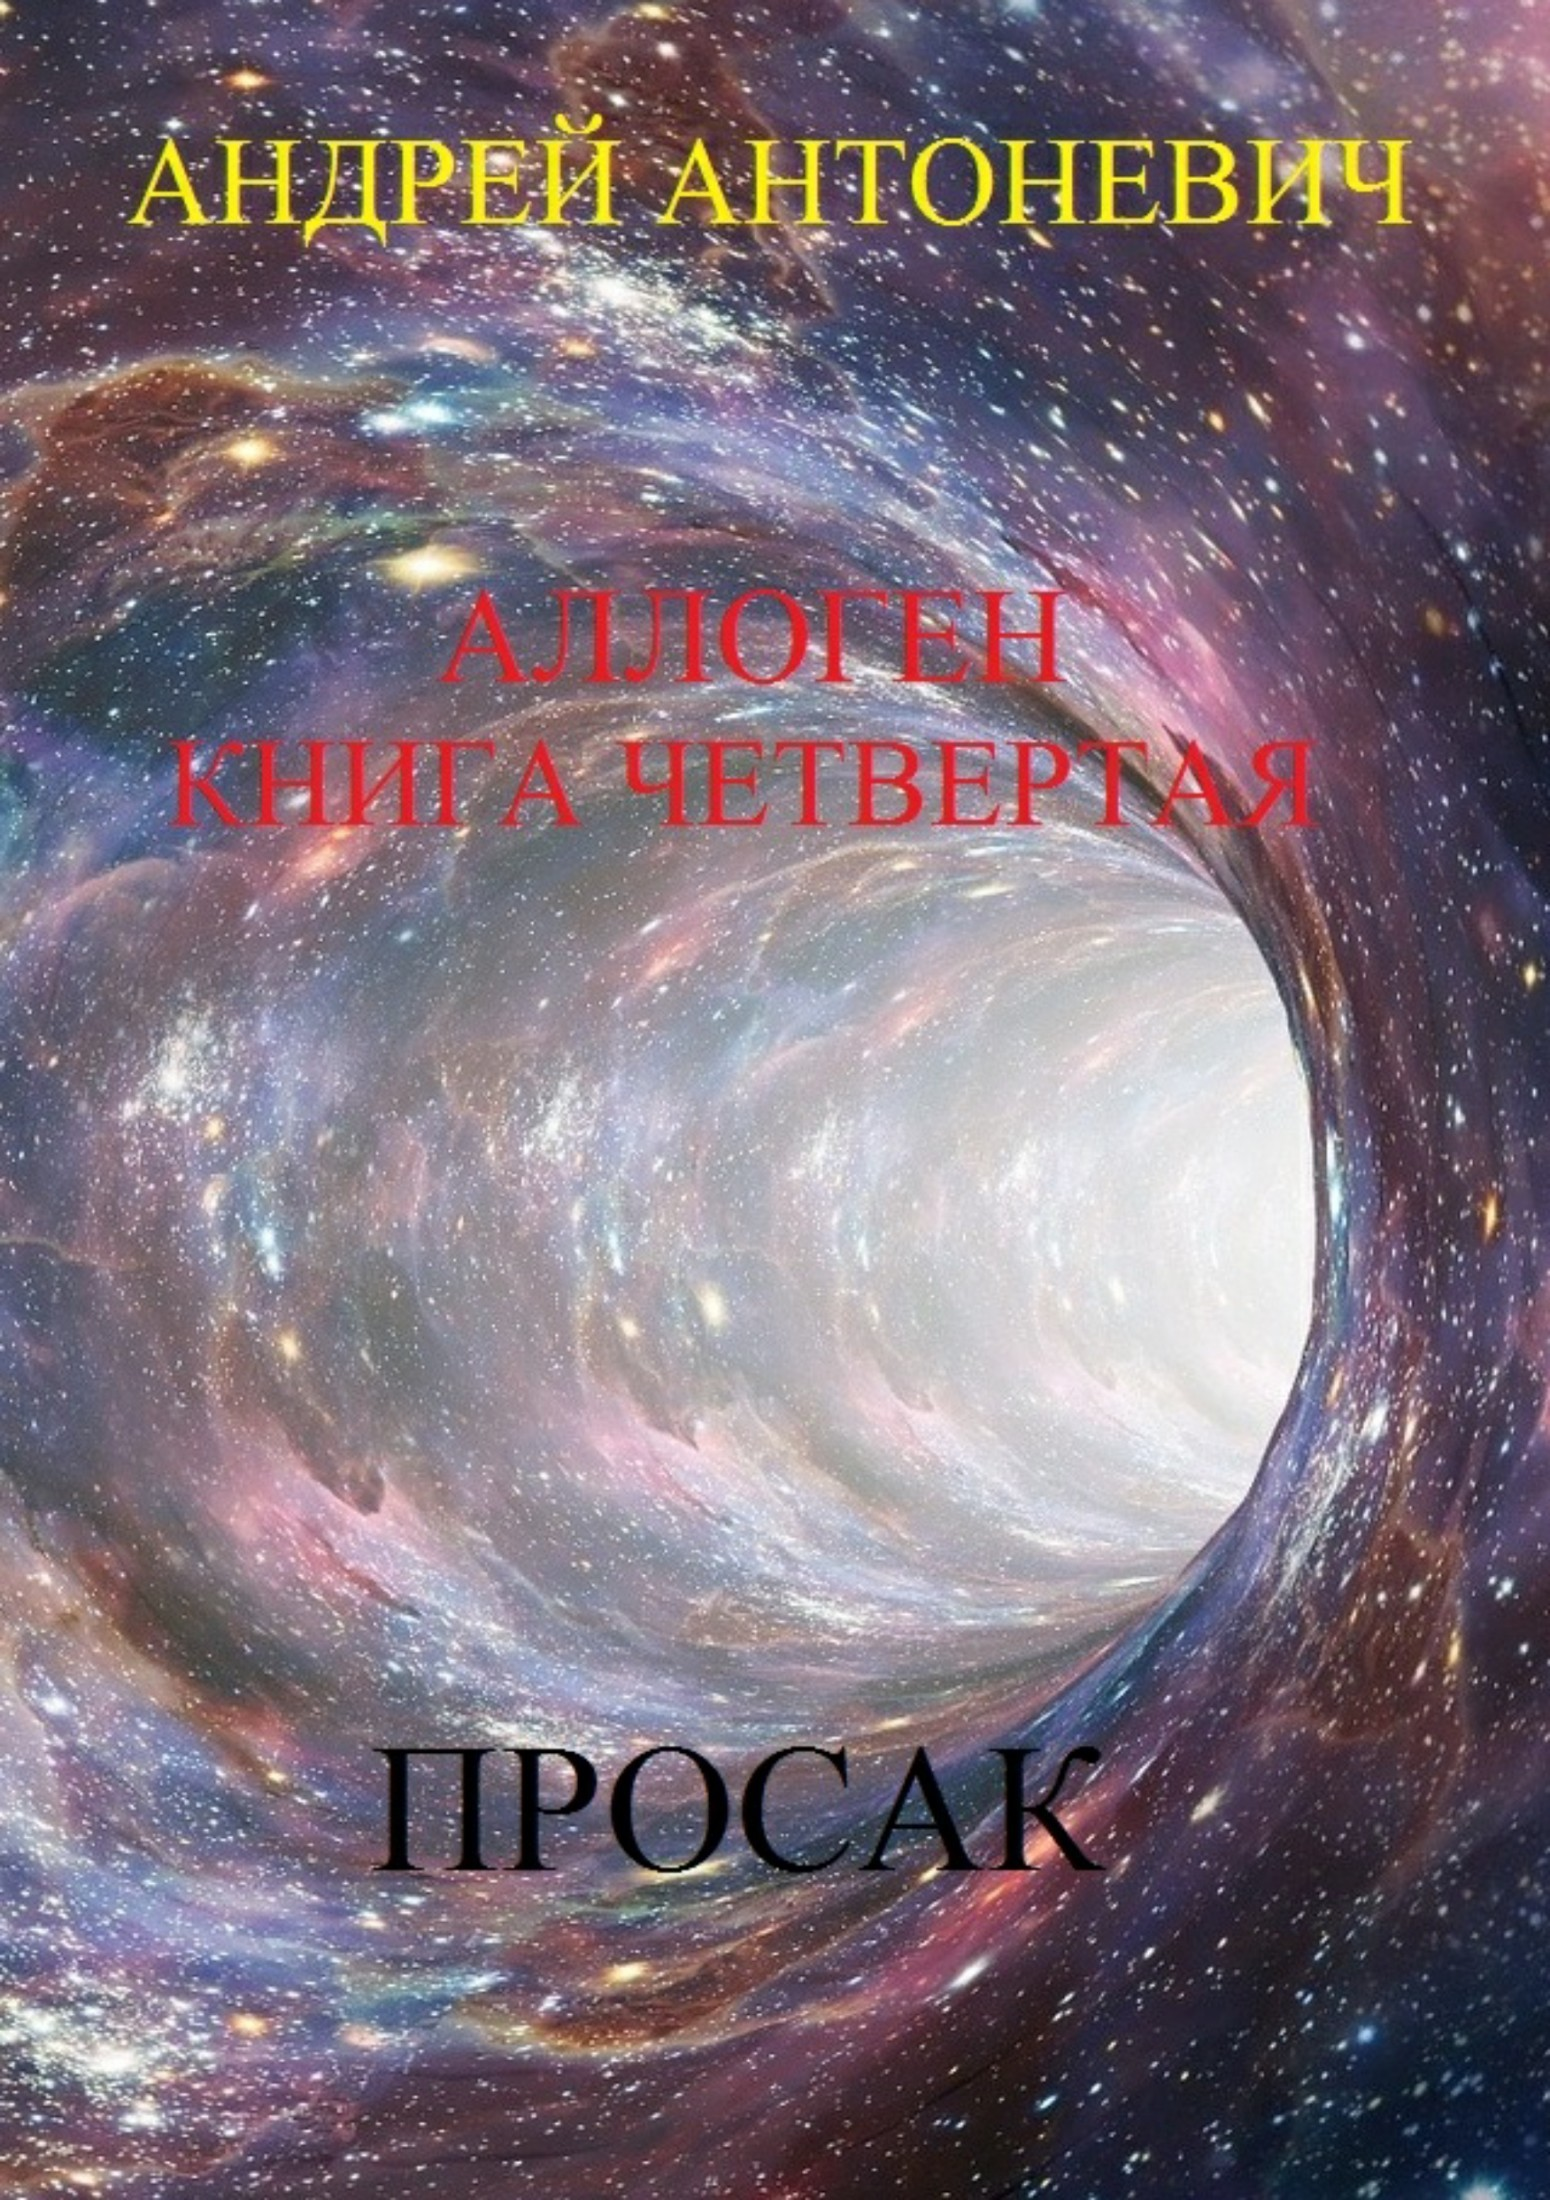 Андрей Антоневич - Аллоген. Книга четвертая. Просак